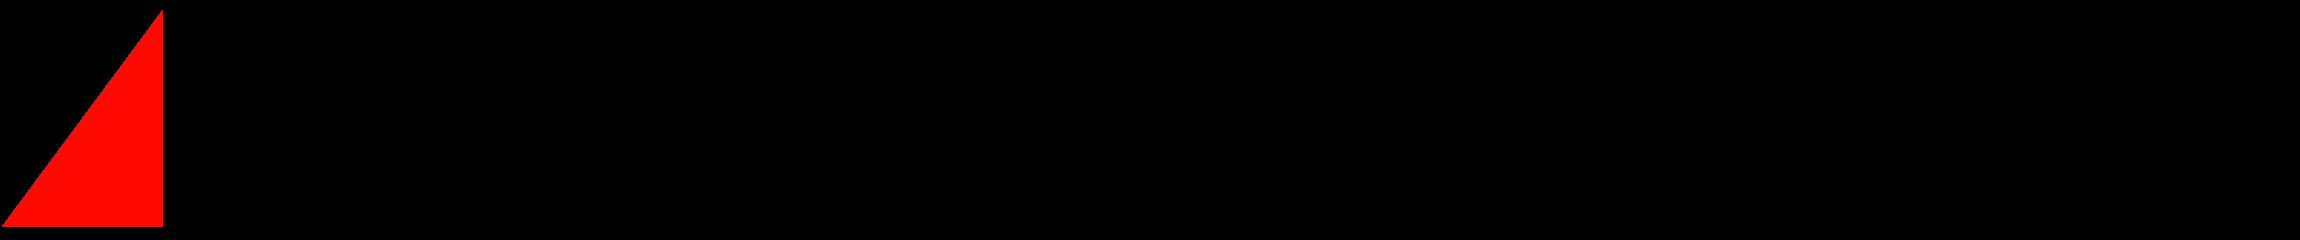 Portal-21